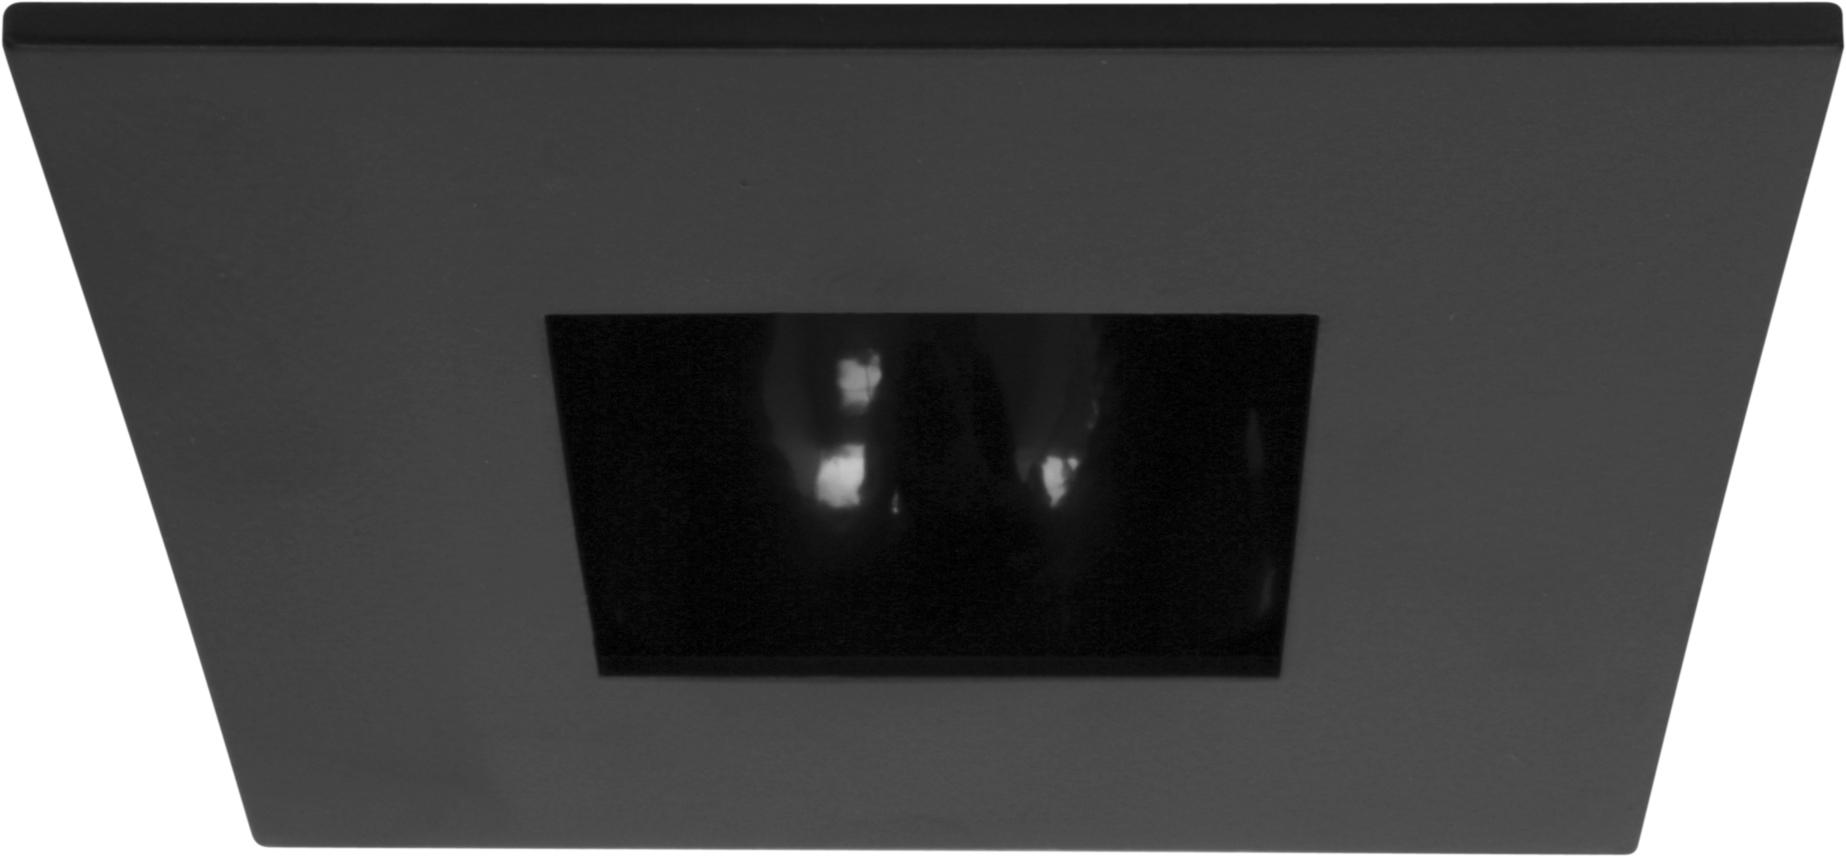 3 Quot Die Cast Square Adjustable Reflector Trim Elco Lighting